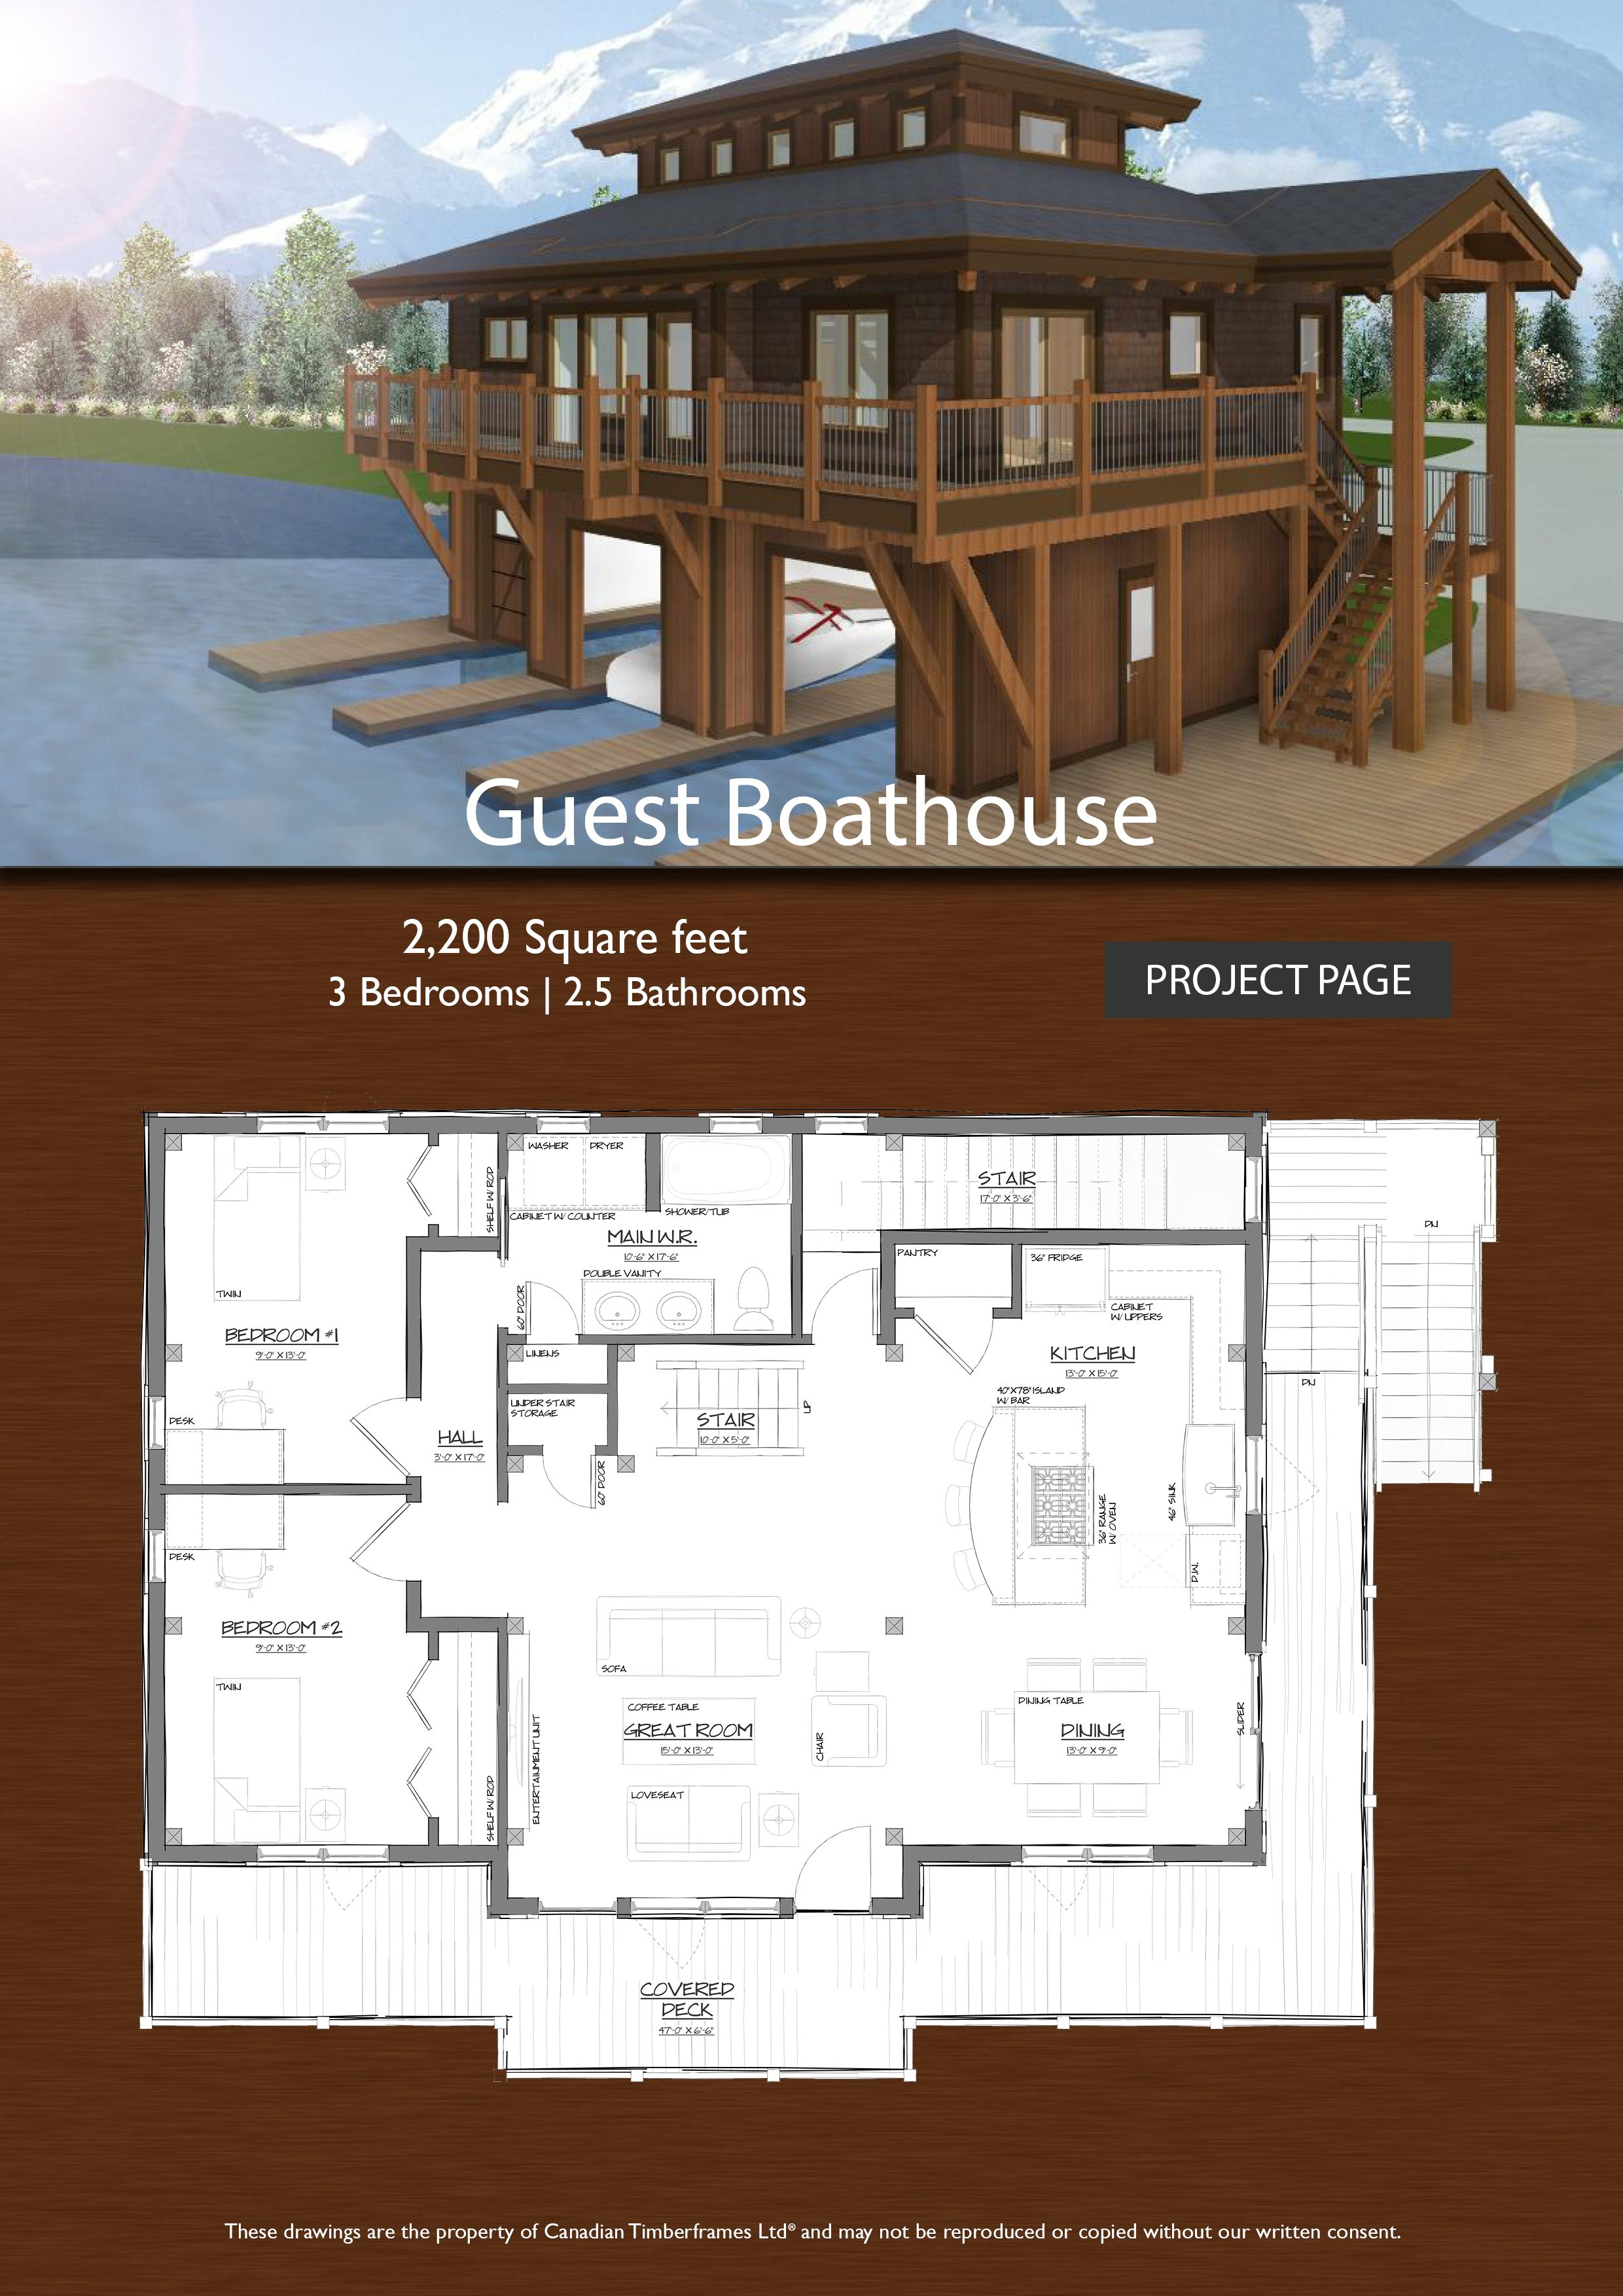 Guest Boathouse Timber Frame Design House Boat Lakefront Living Boat Building Plans